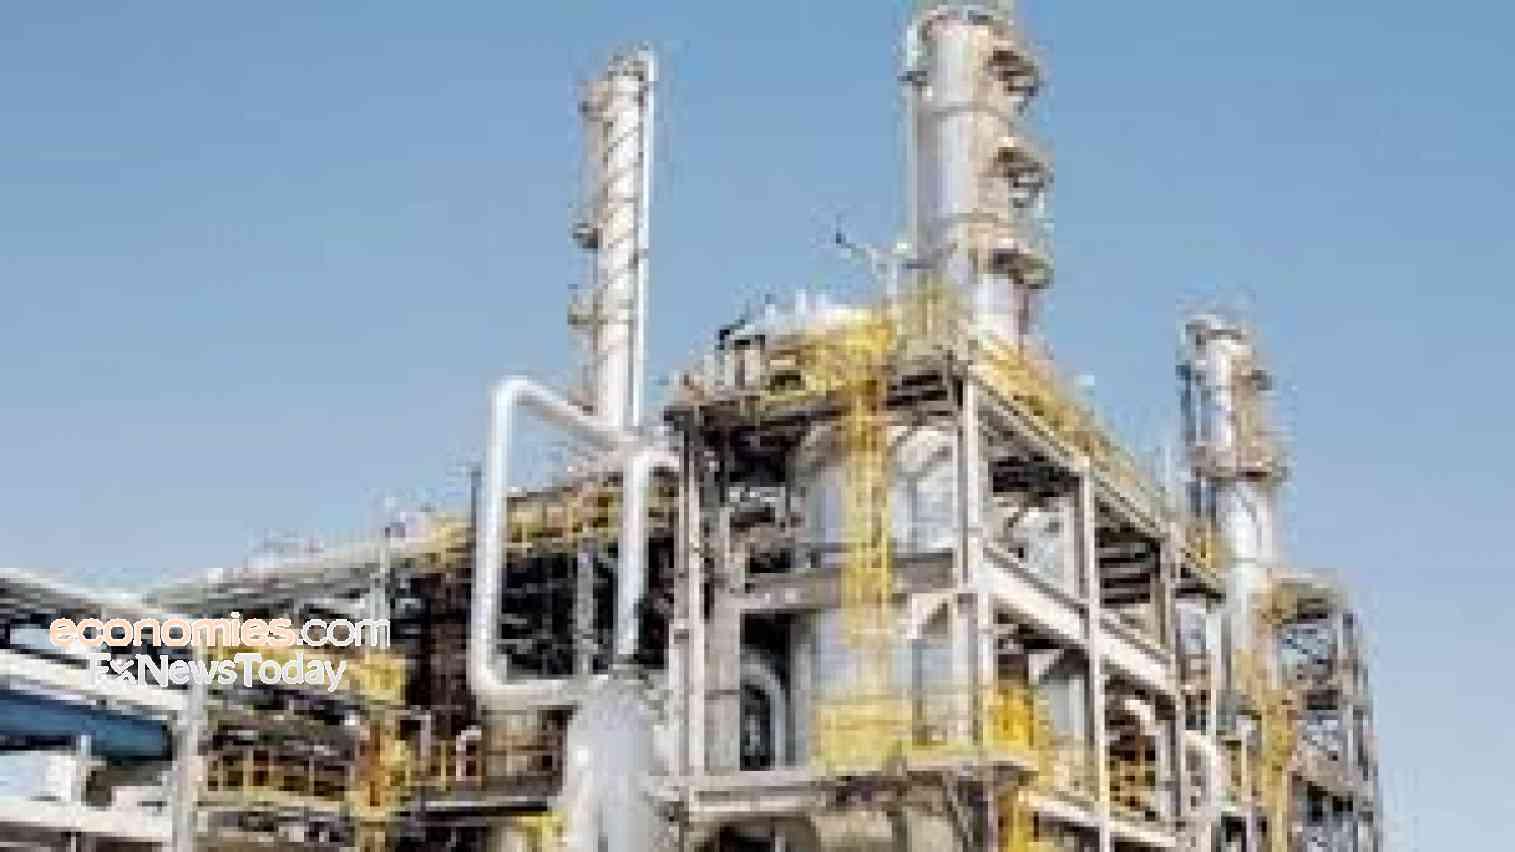 Nama Chemicals gets CMA's nod on SAR200 million capital hike